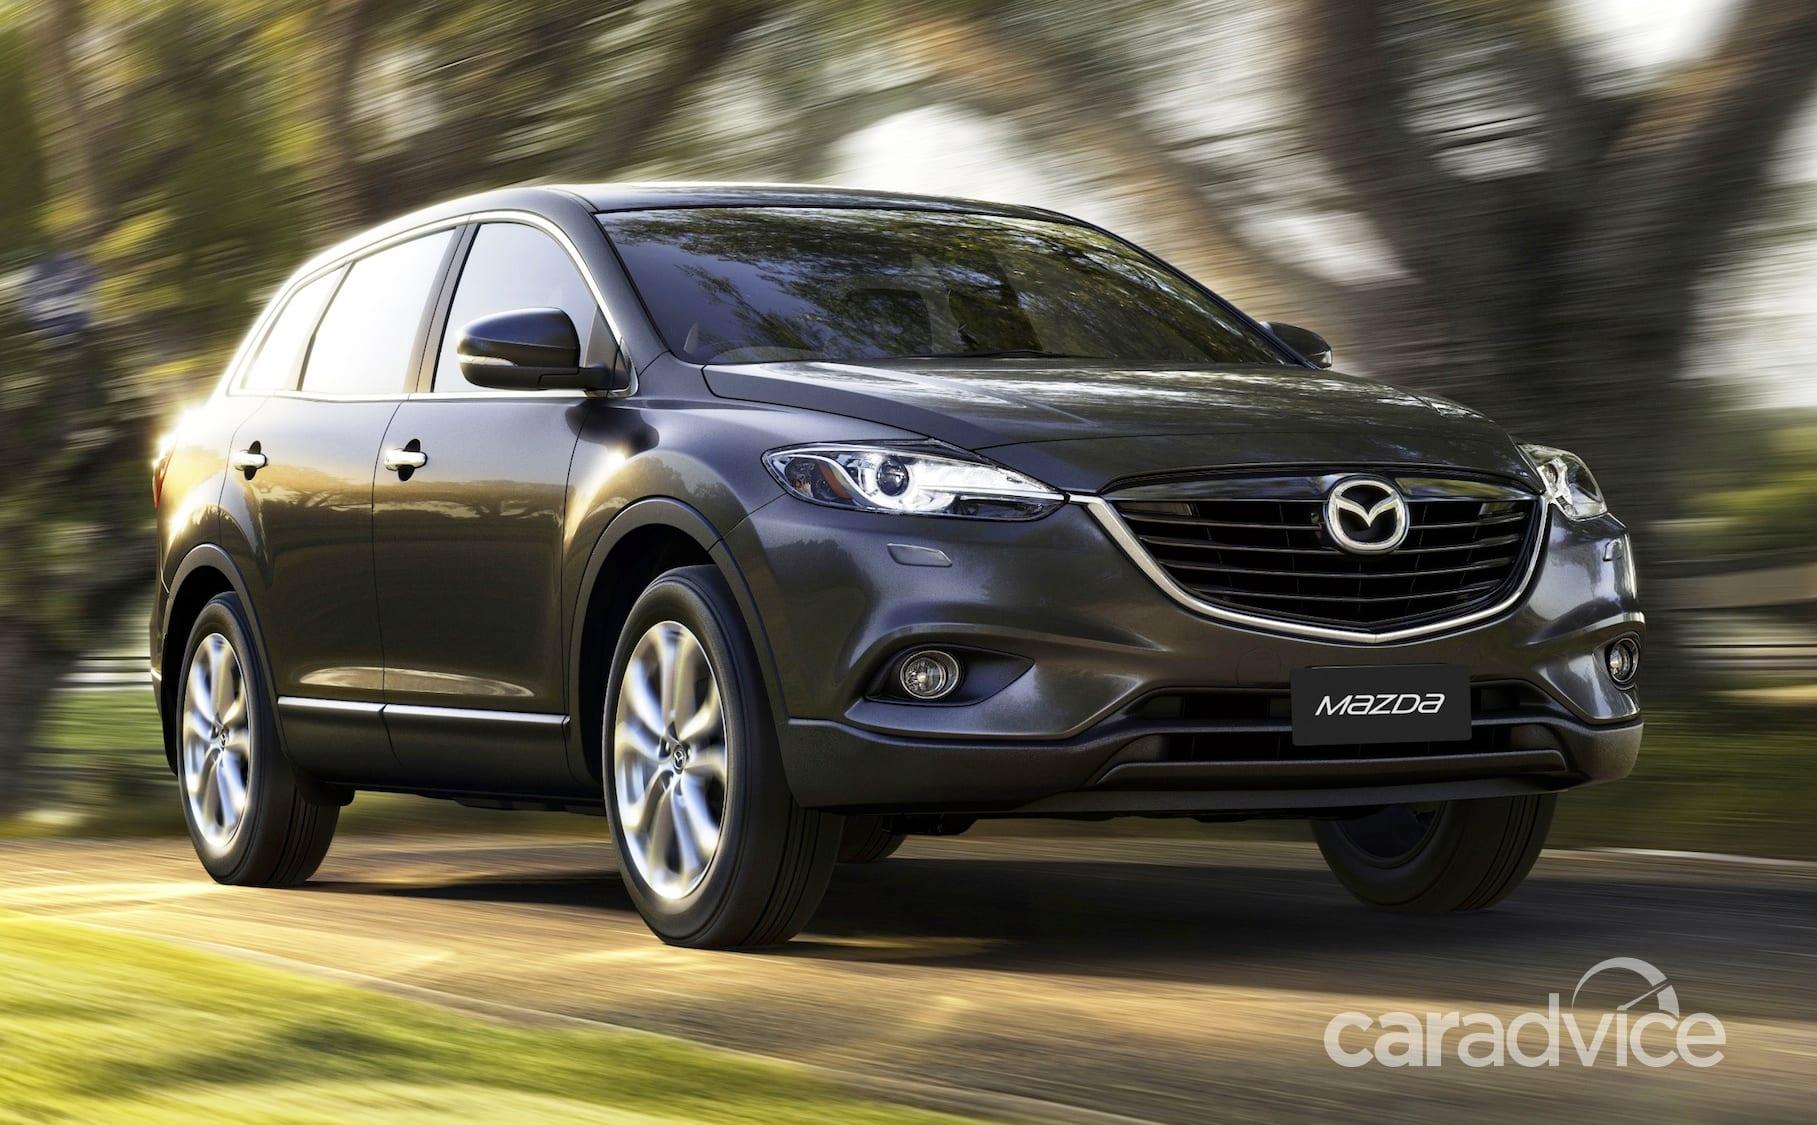 2013 Mazda CX-9 unveiled: global debut in Australia ...